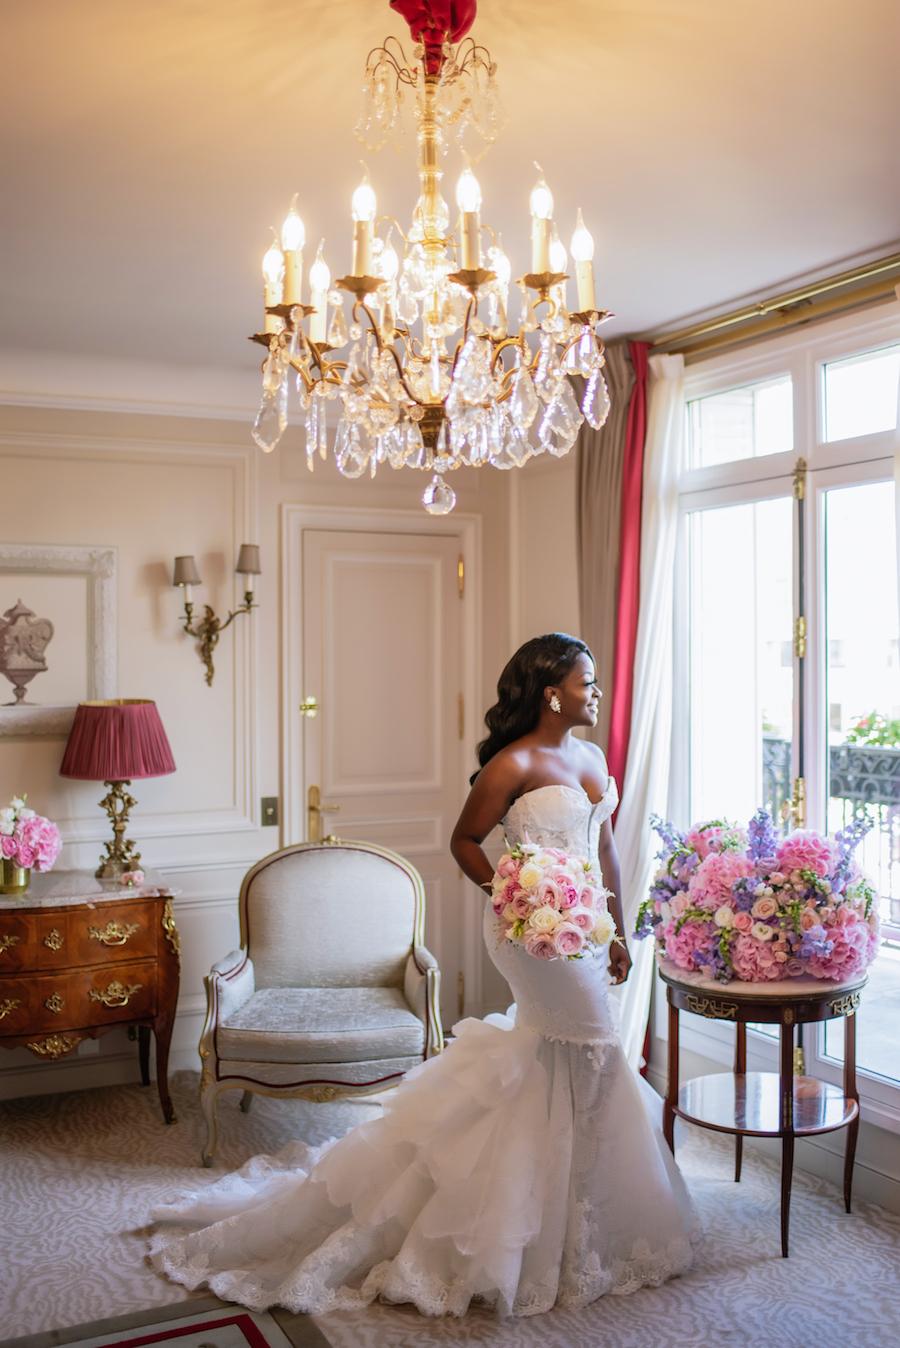 Funke-and-Jide_wedding_fall-2018_munaluchi-bride-magazine_munaluchi_decor_fashion_bridal_gown_paris_france_paris-wedding_multicultural-love61.jpg